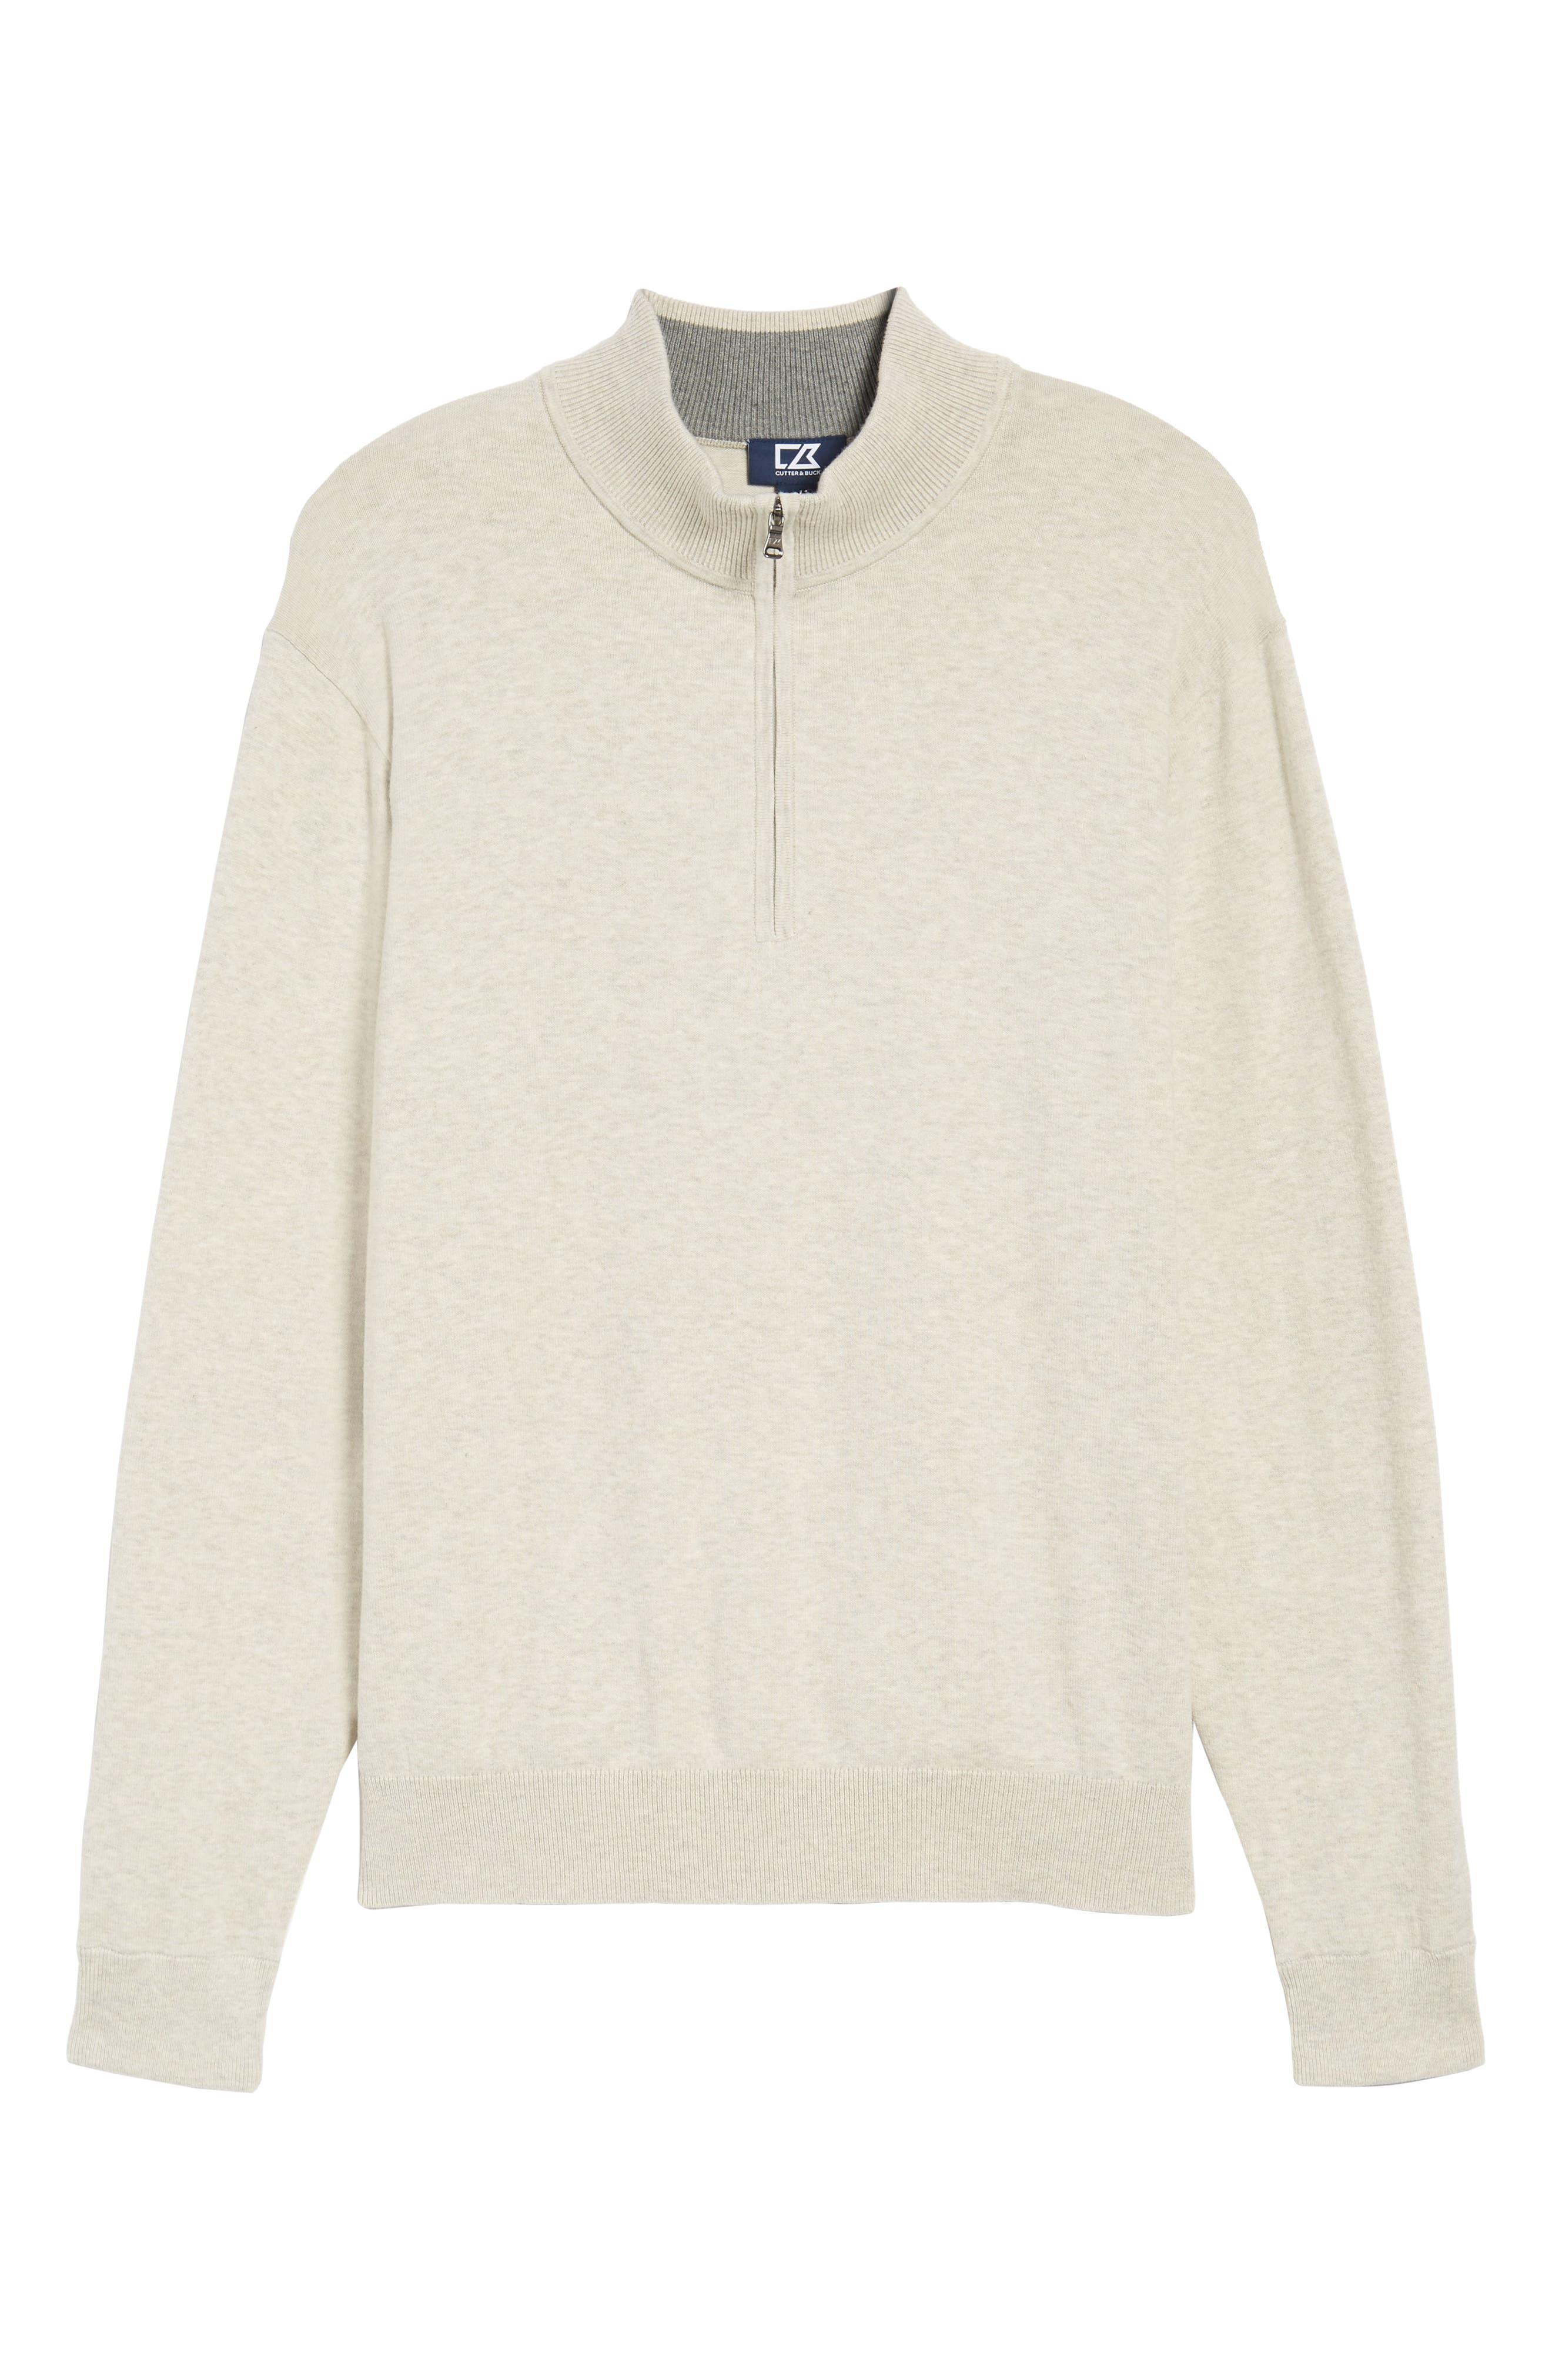 CUTTER & BUCK,                             Lakemont Classic Fit Quarter Zip Sweater,                             Alternate thumbnail 6, color,                             OATMEAL HEATHER